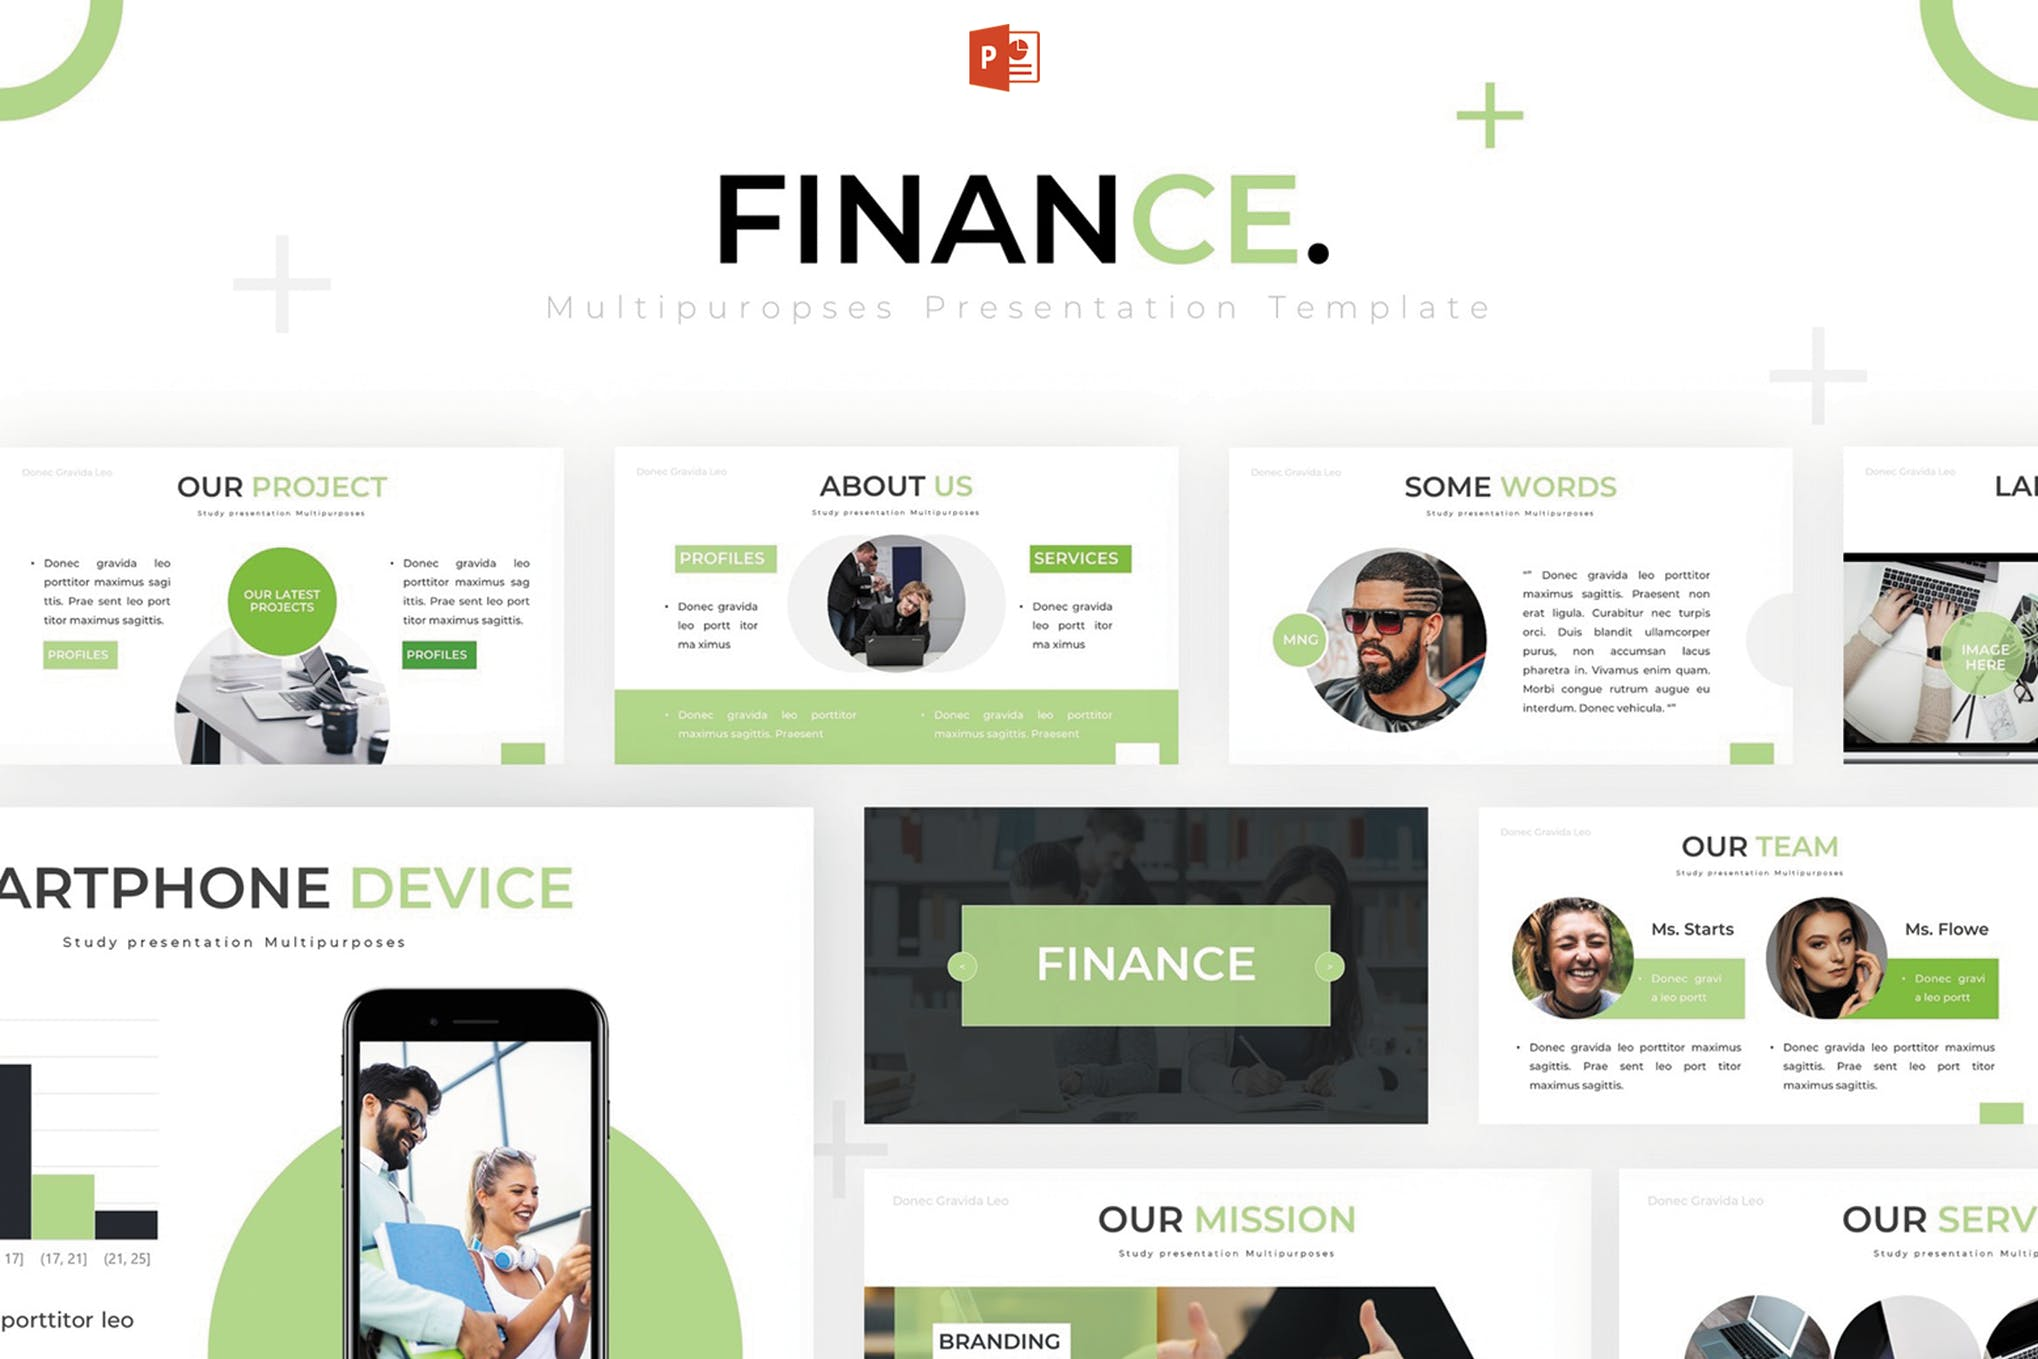 keuangan template PowerPoint